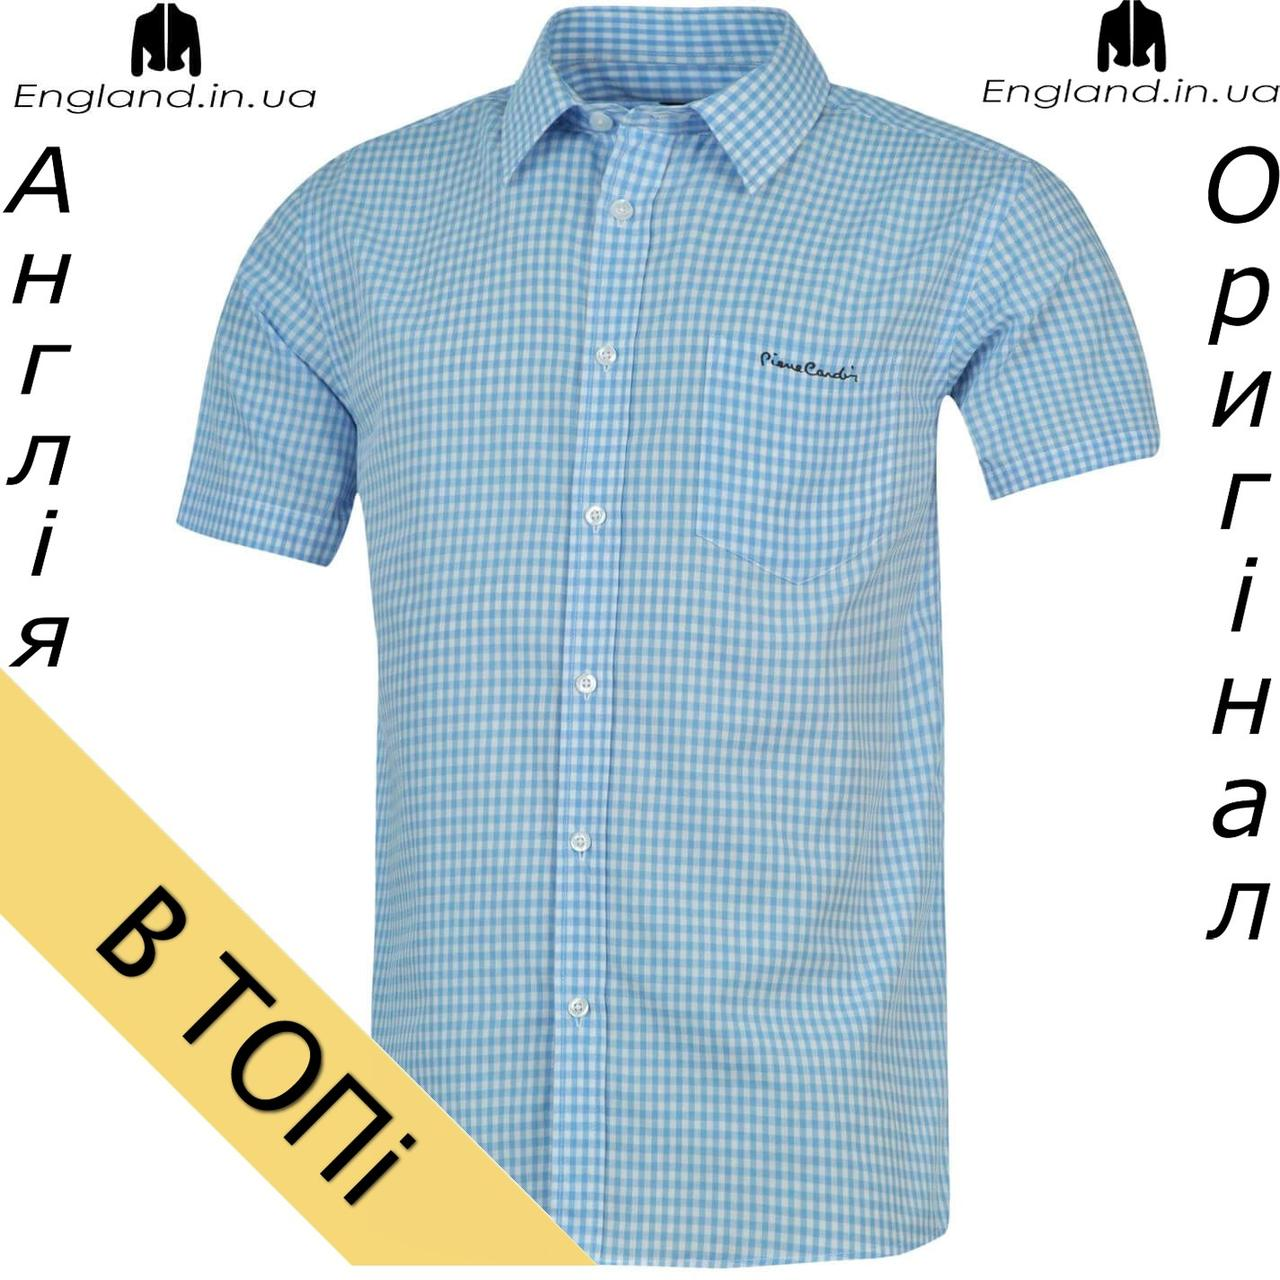 Рубашка мужская Pierre Cardin светло-синяя на короткий рукав